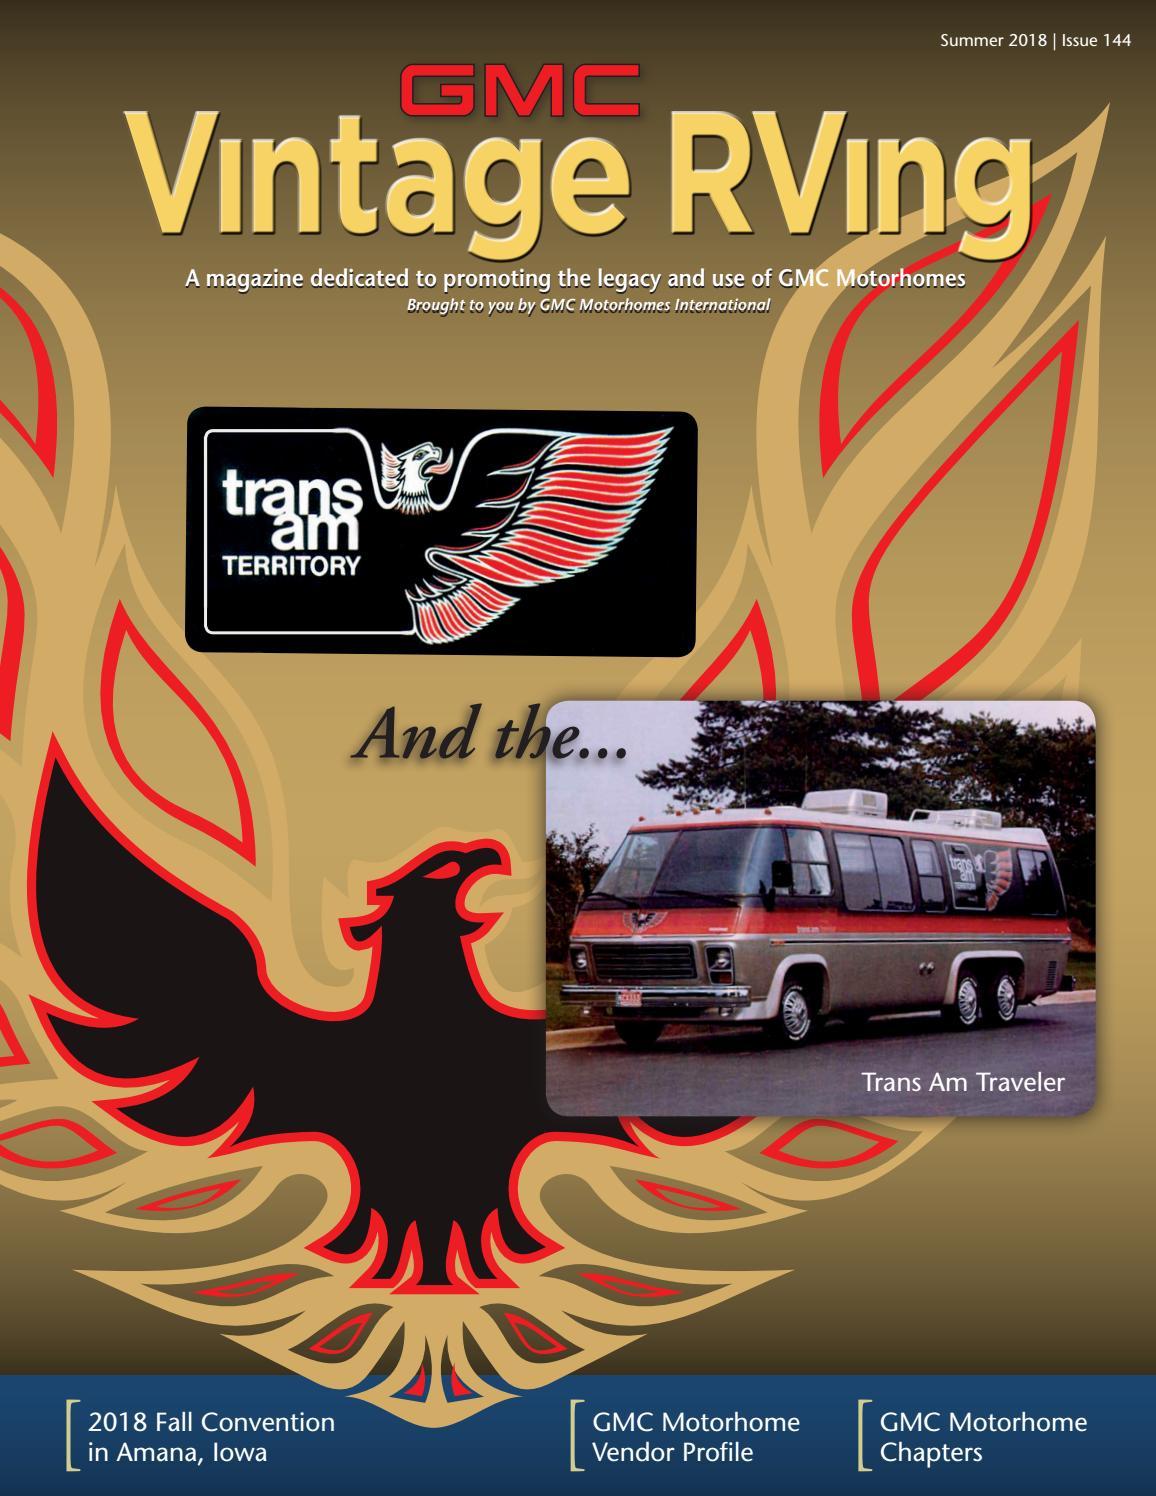 Gmc Vintage Rving Magazine Fall 2018 By Ceva Design Issuu